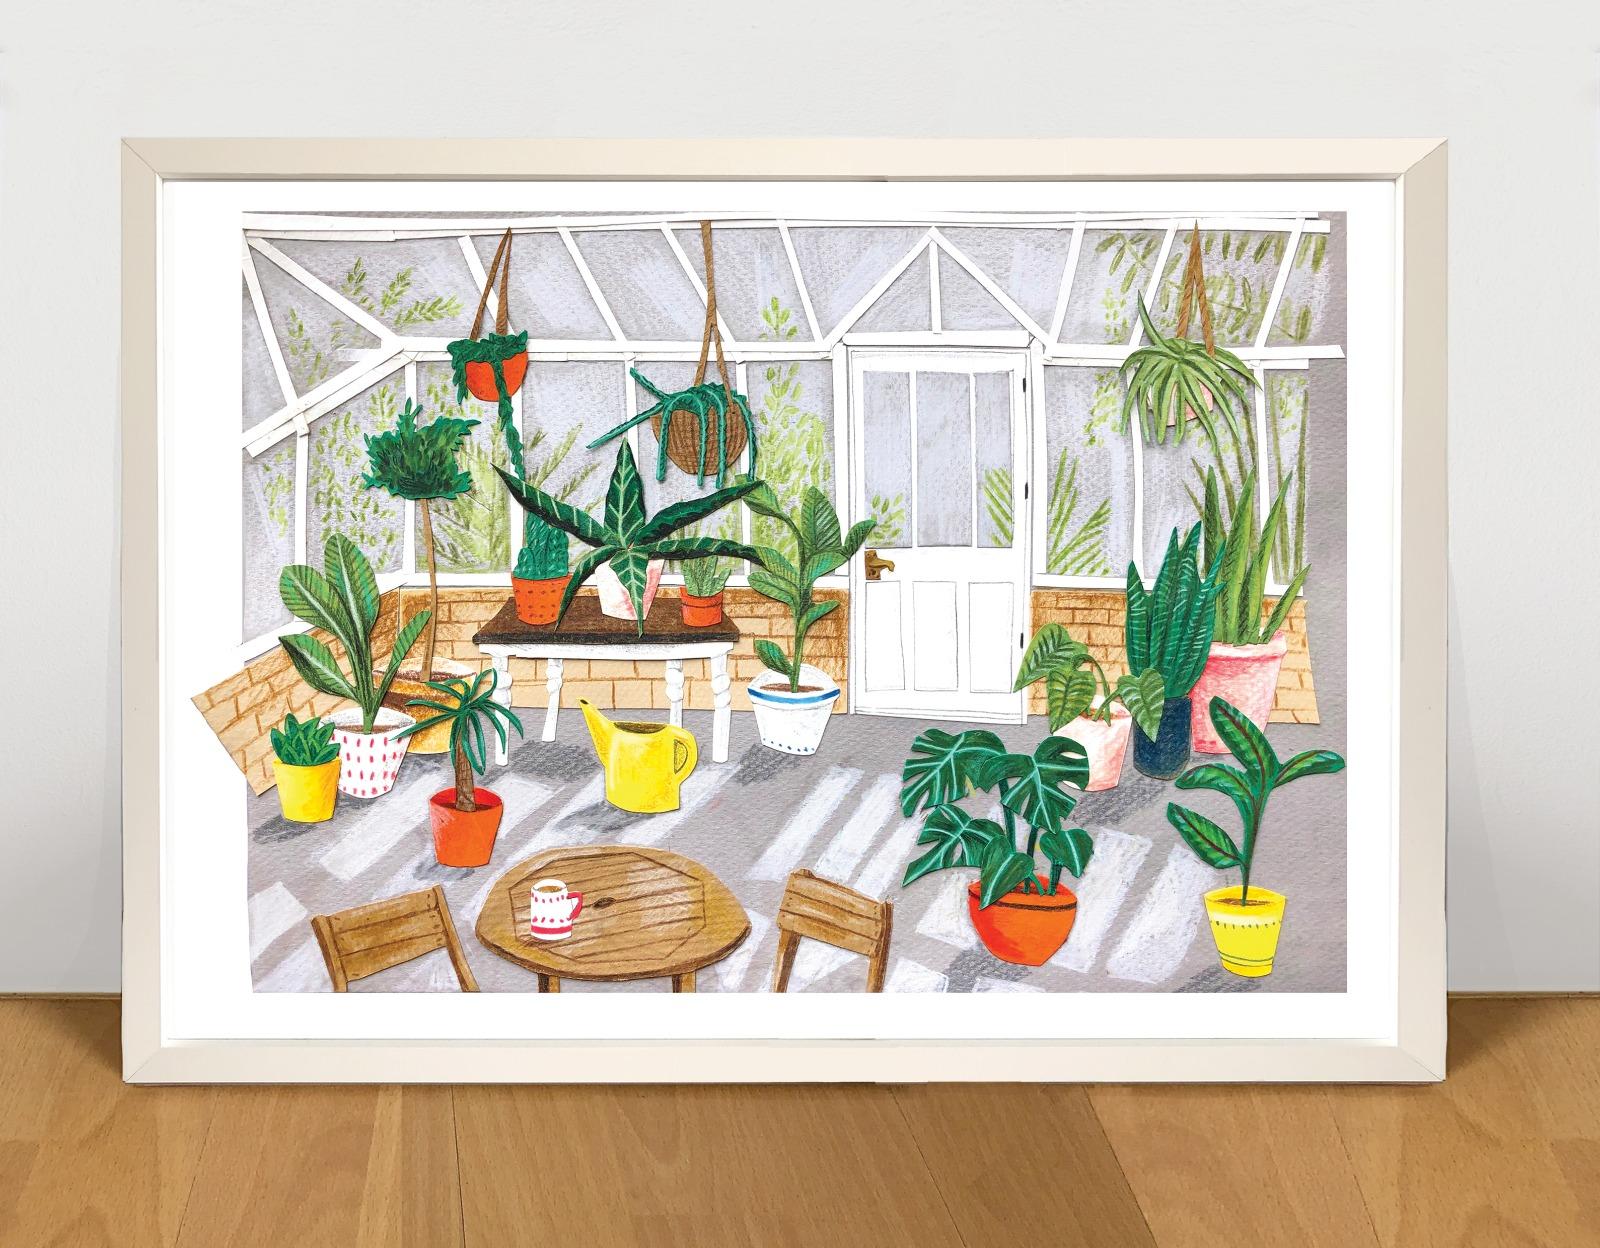 Kaitlin Mechan A4 Greenhouse Print